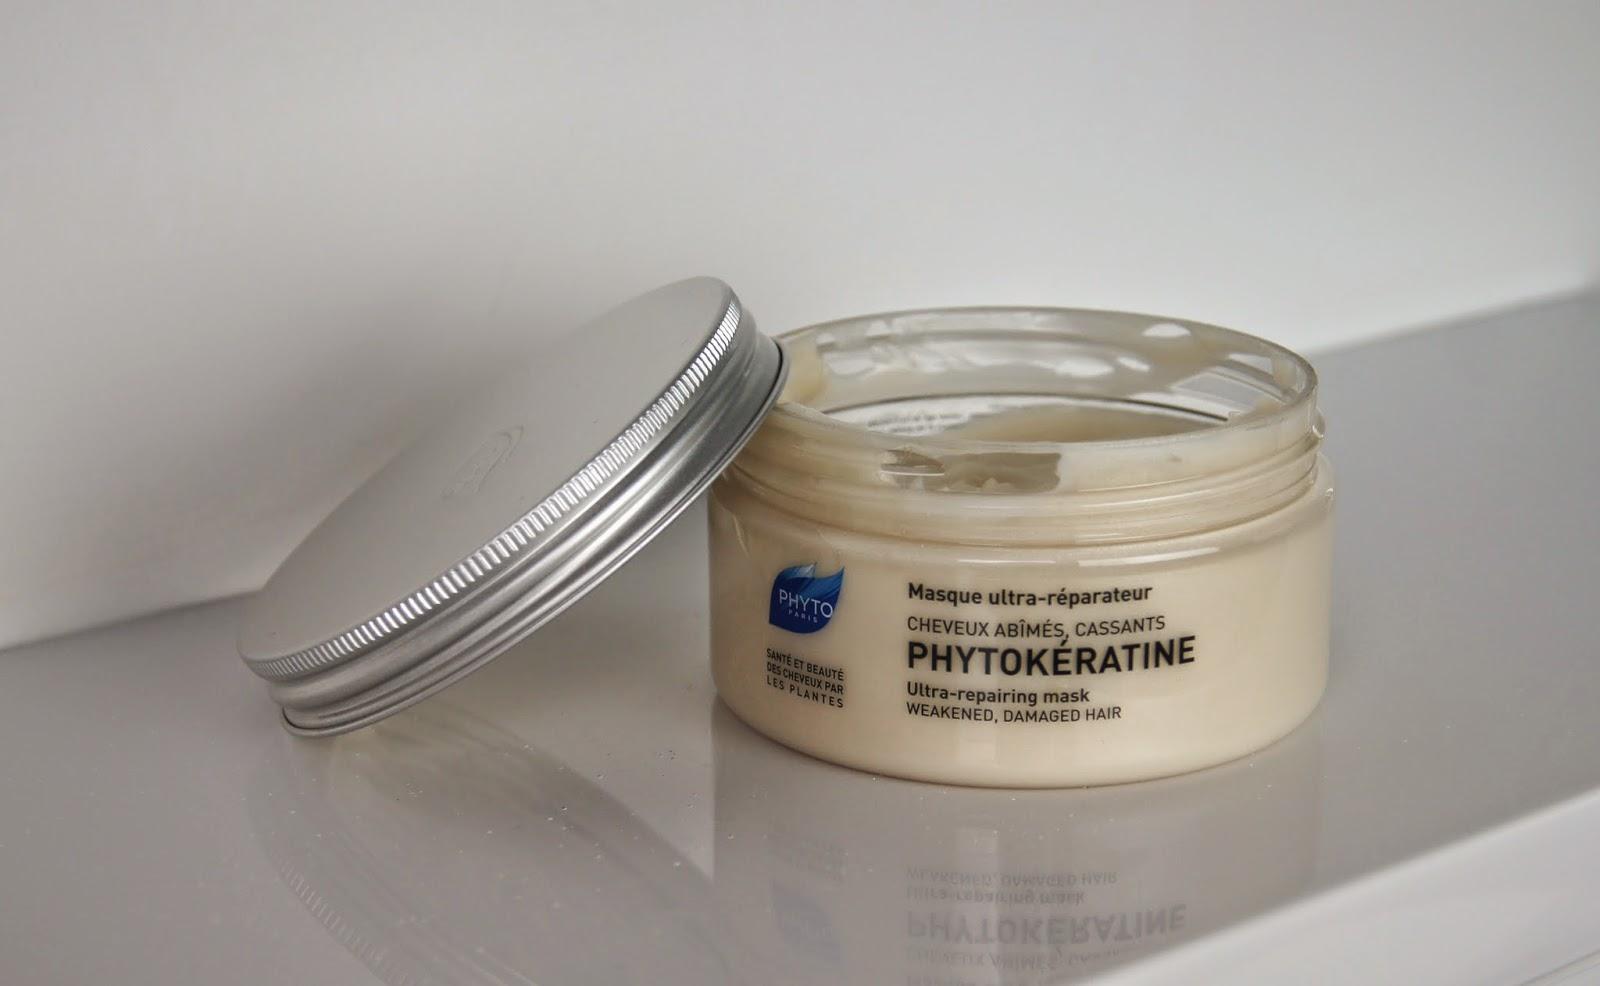 phyto phytokeratine ultra-repair hair mask review